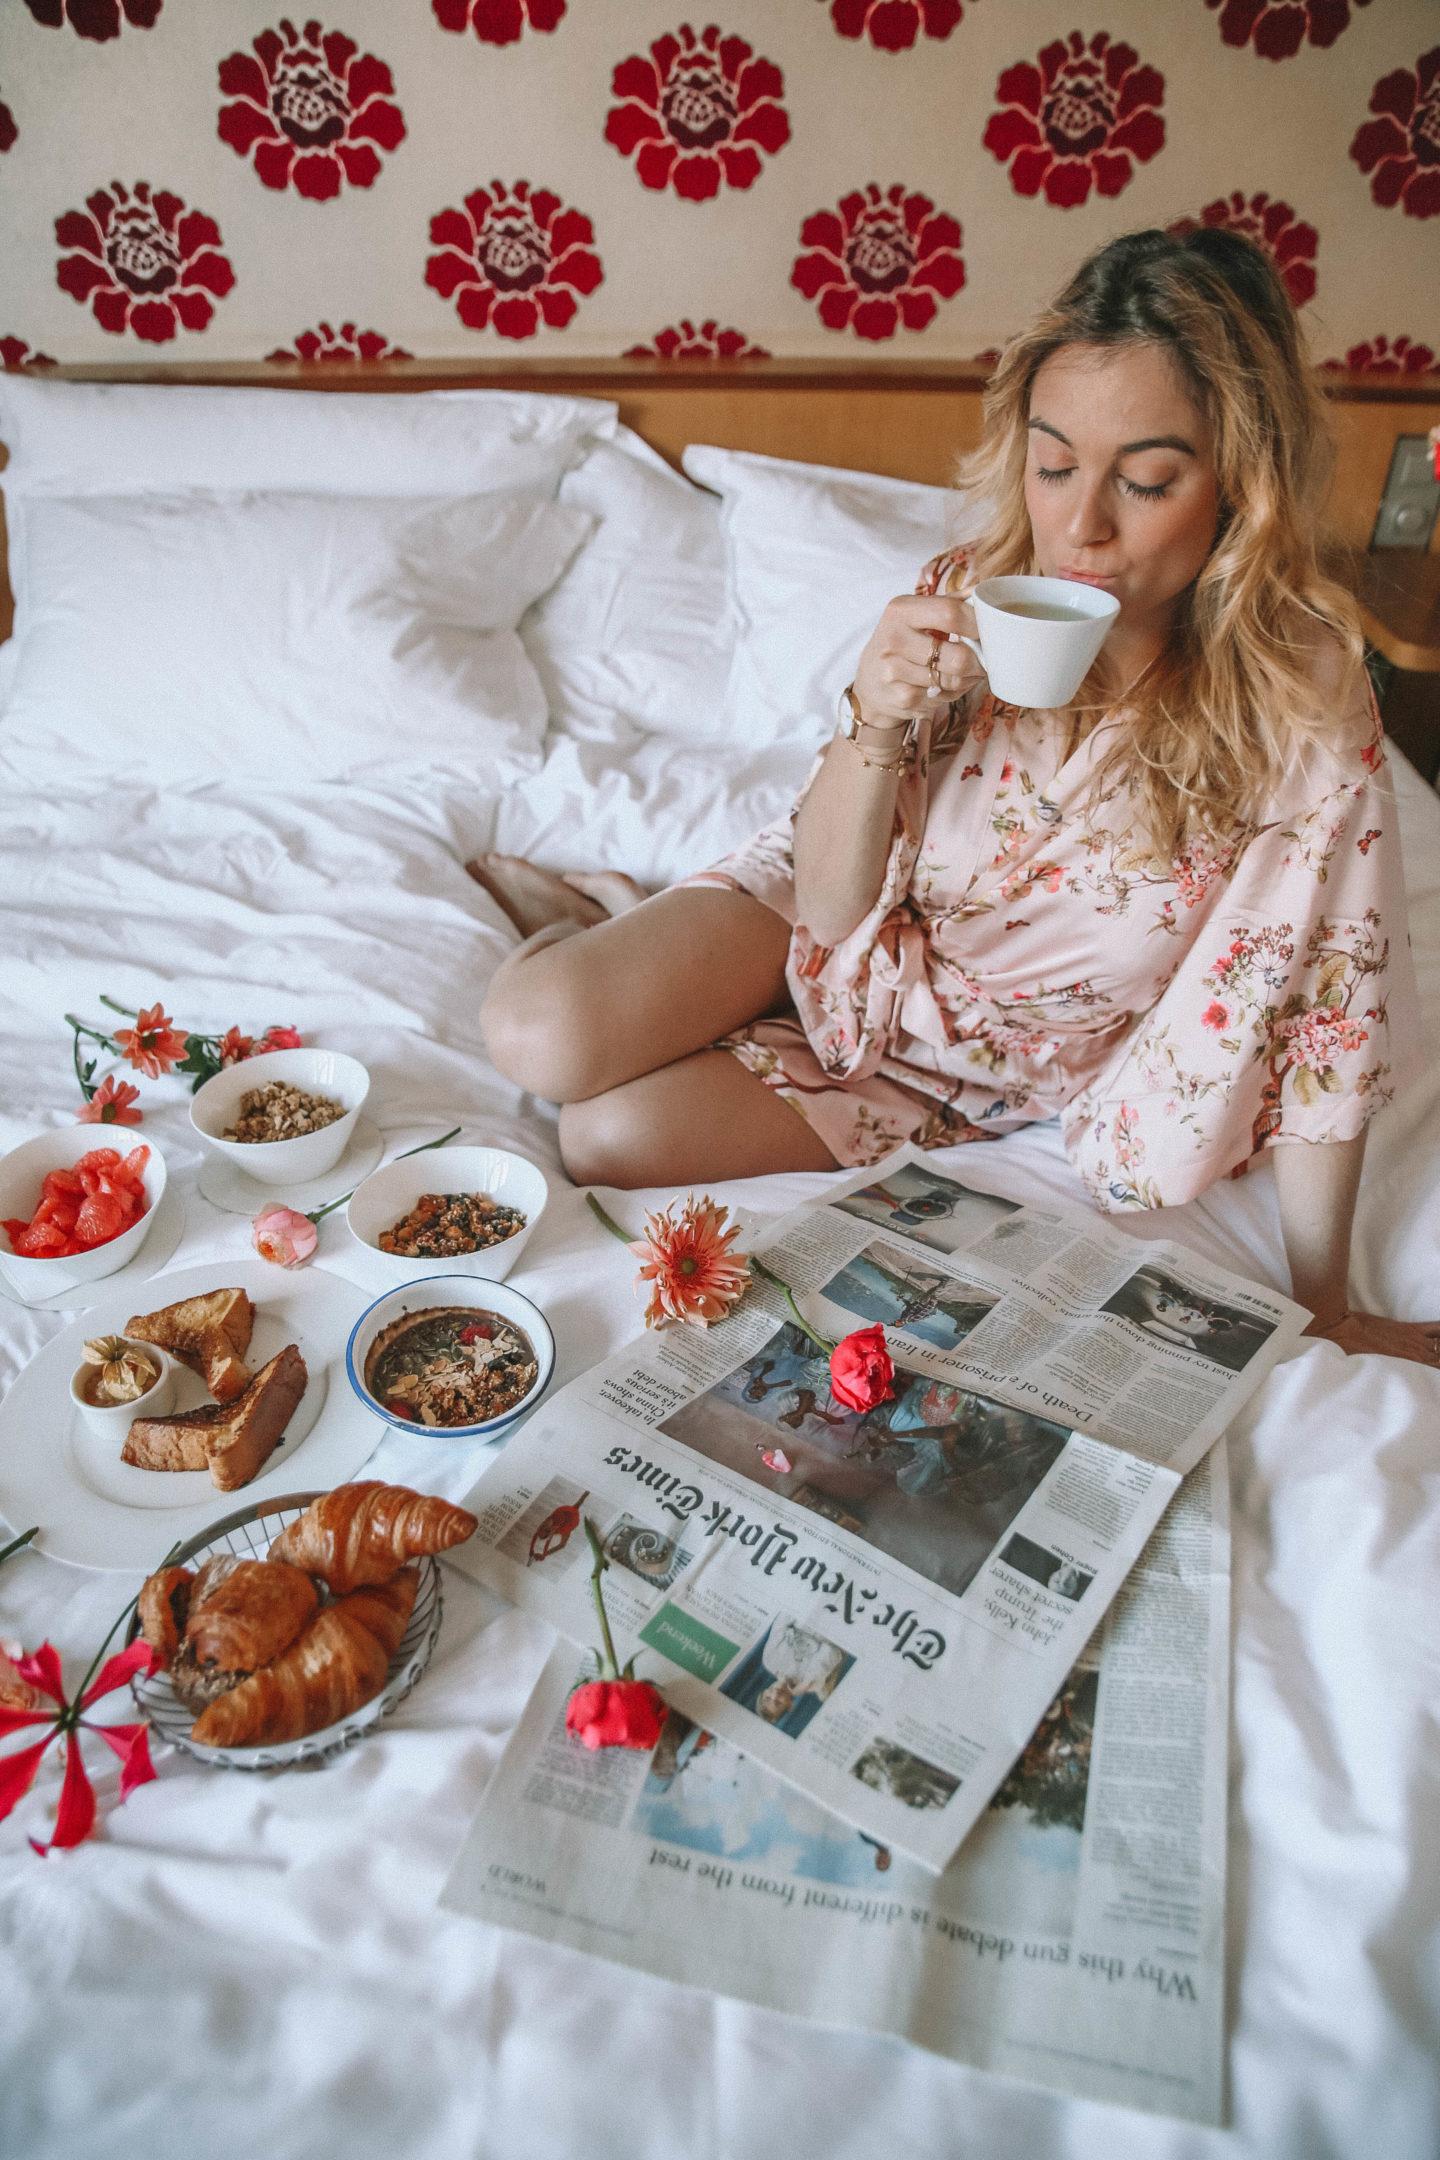 Lingerie Etam - Blondie baby blog mode et voyages